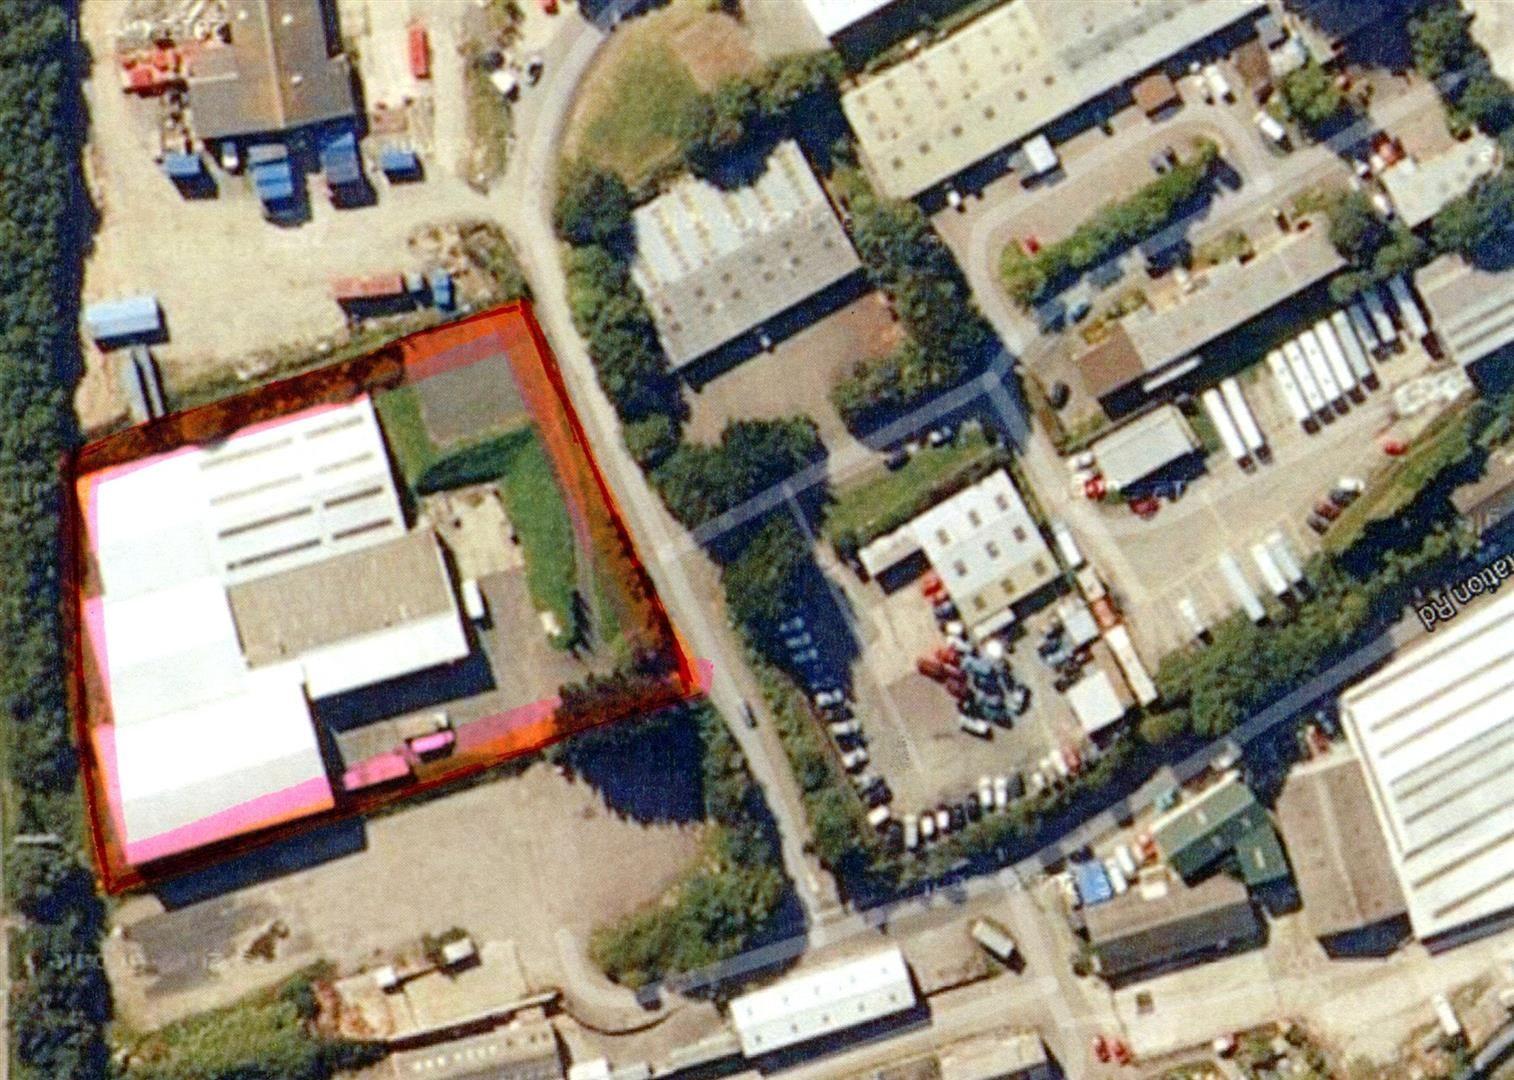 Property photo 1 of 1. Stewarts Warehouse B678.Jpg